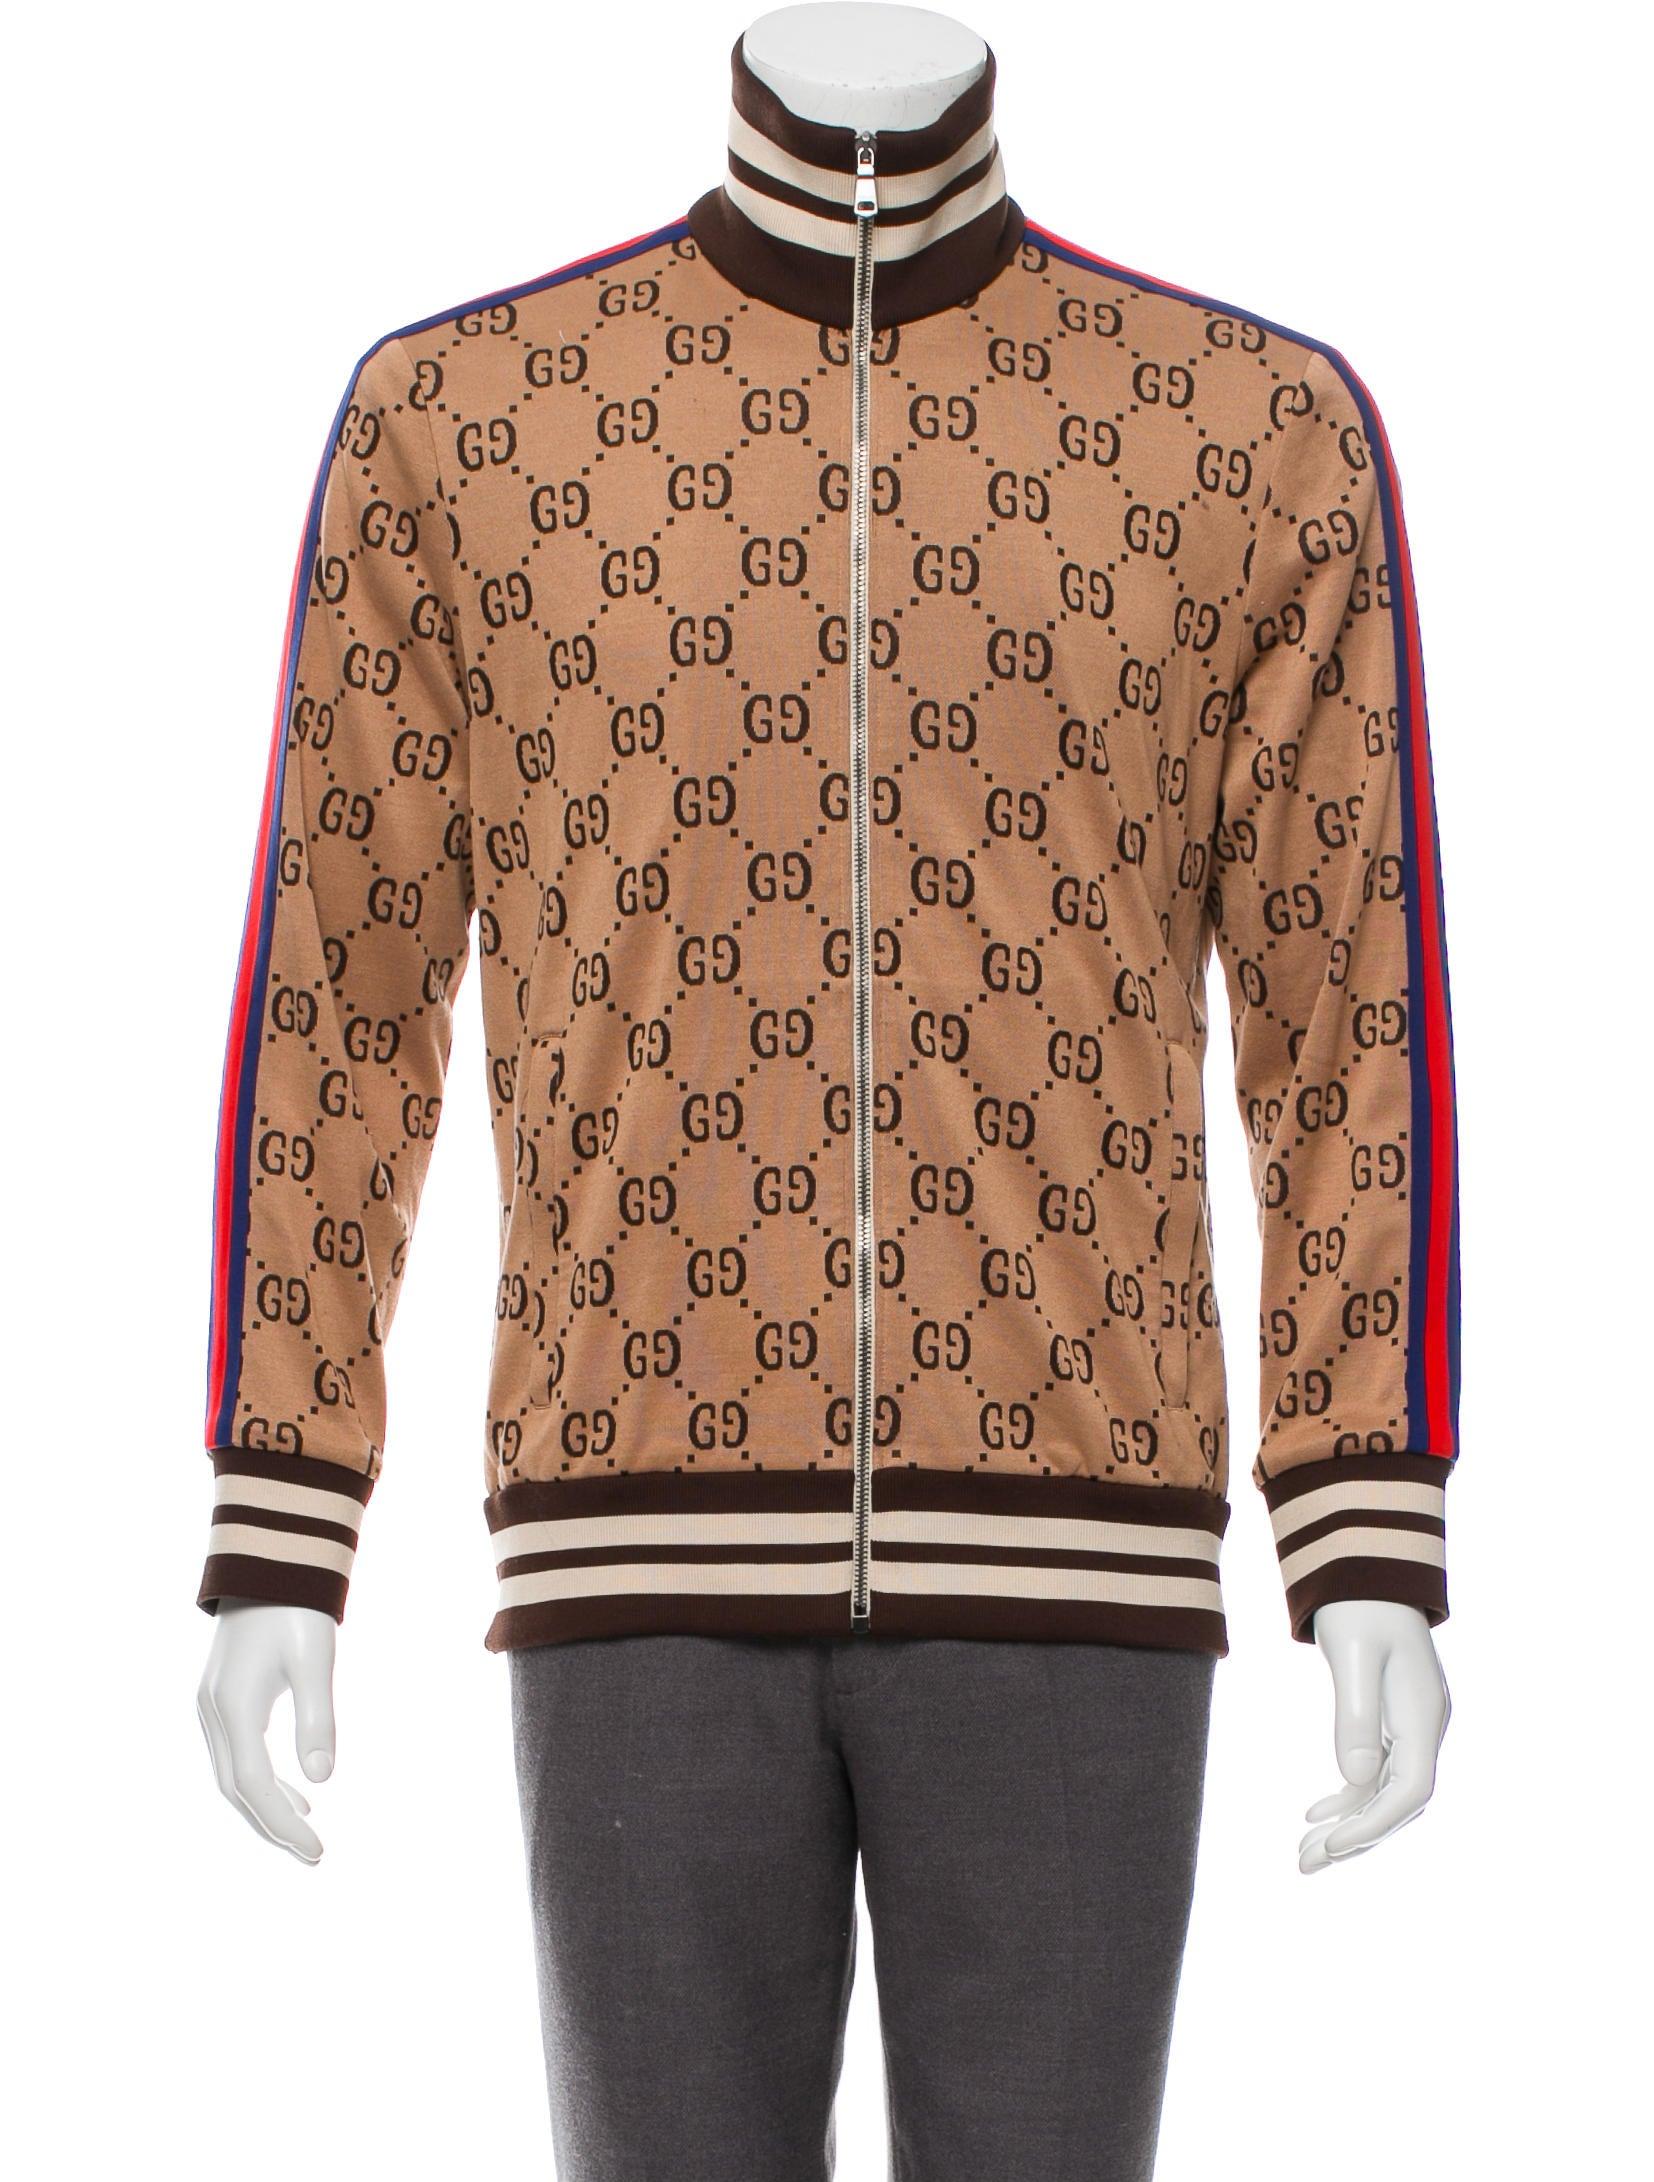 341fc1854 Gucci 2018 GG Jacquard Track Jacket - Clothing - GUC290542